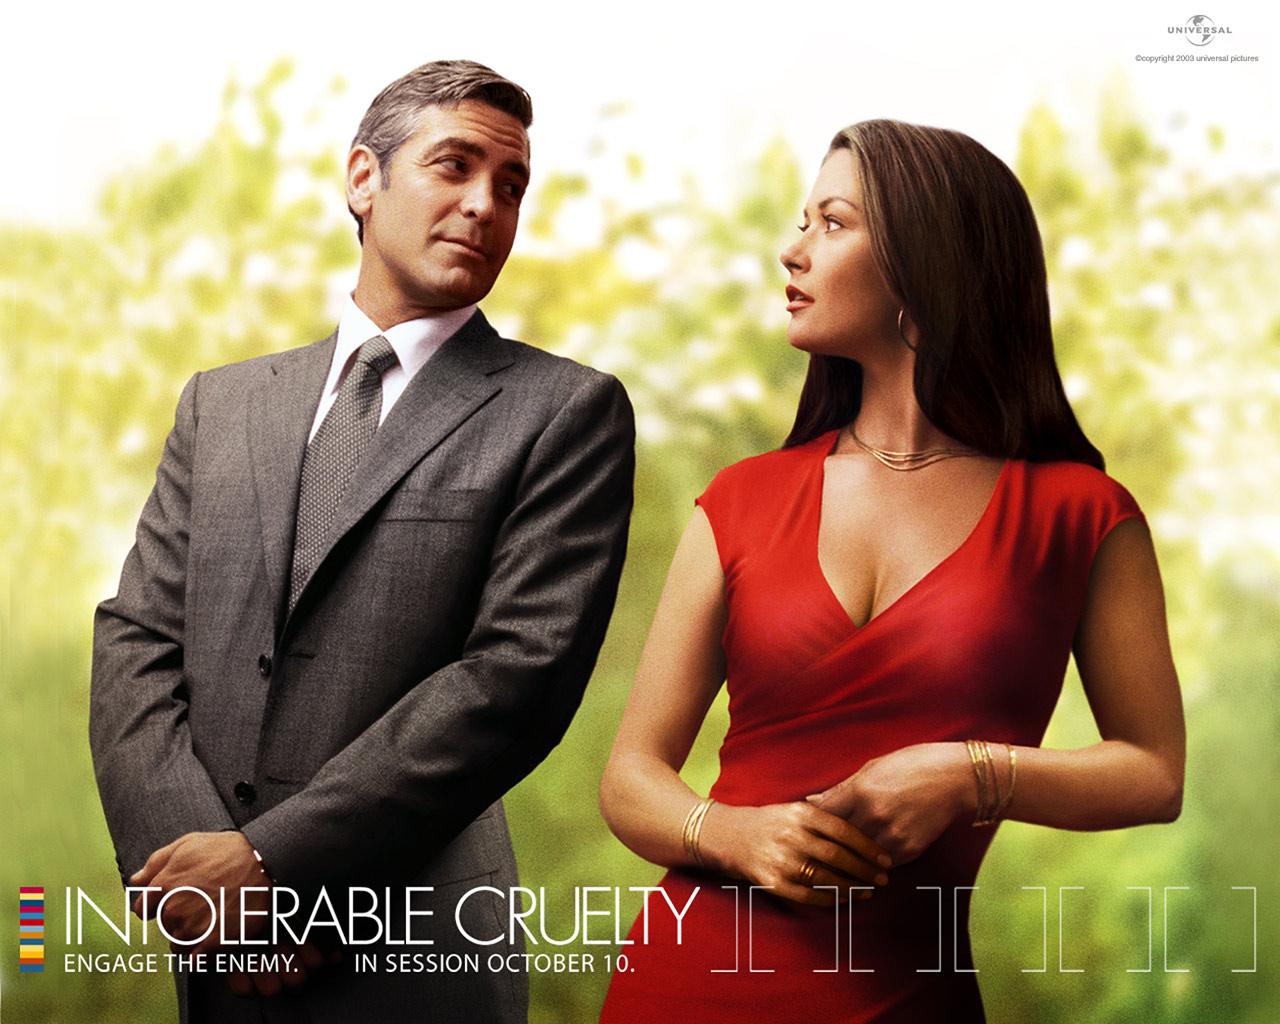 http://4.bp.blogspot.com/_UAPSV4DGkYU/THVuoWzvrvI/AAAAAAAAGcA/Mfbx1tC_QaM/s1600/Intolerable_Cruelty,_2003,_George_Clooney,_Catherine_Zeta-Jones.jpg